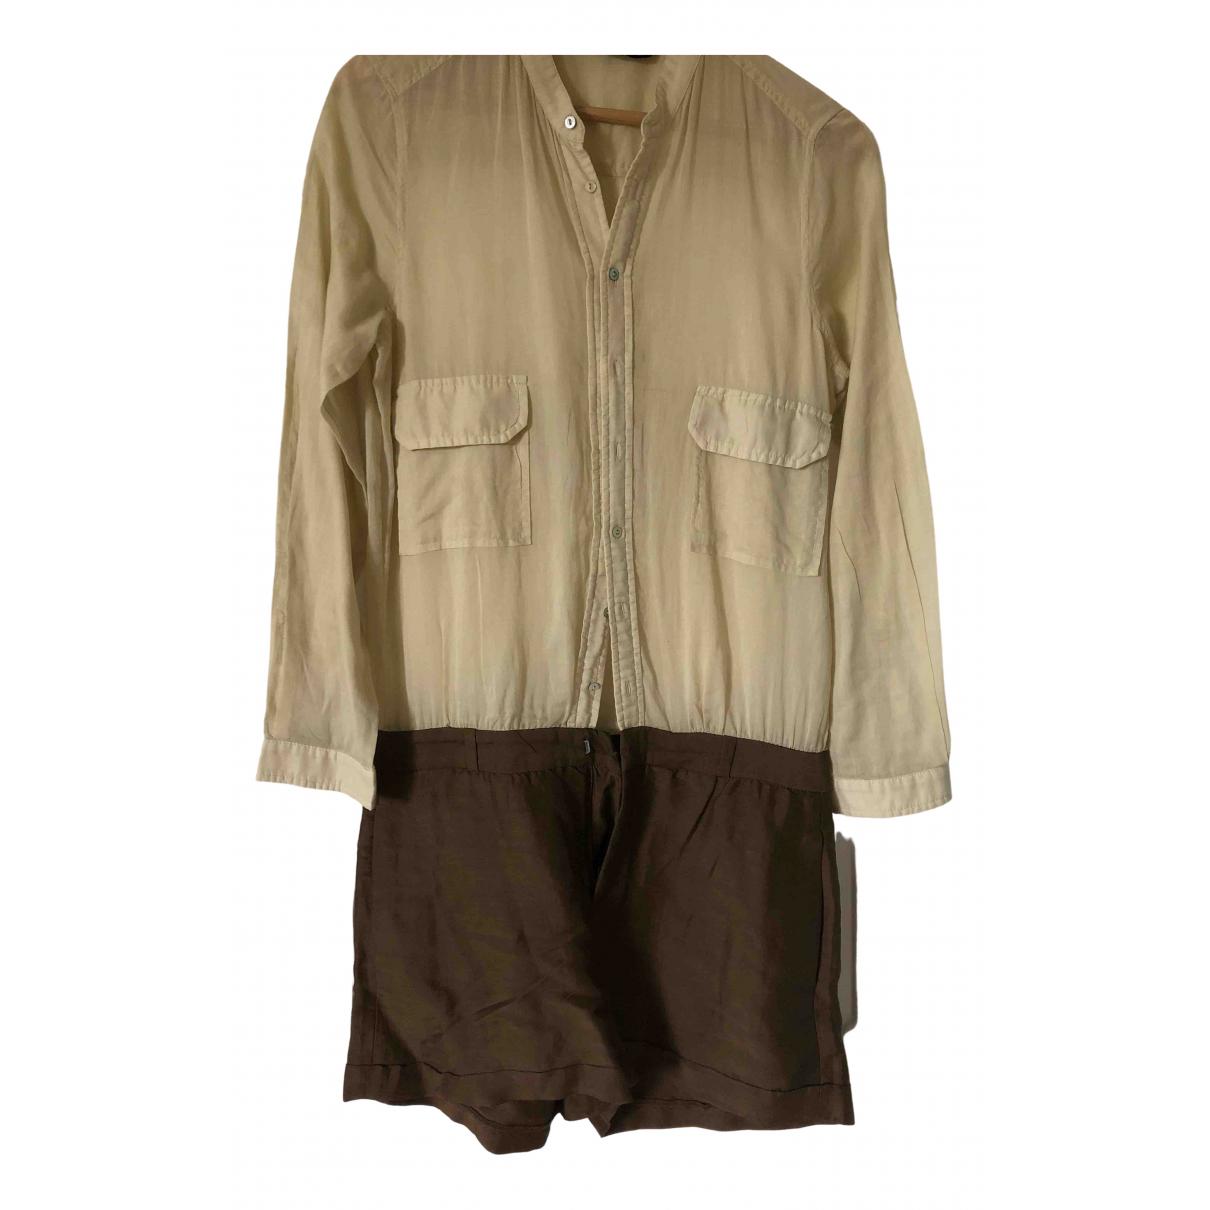 Zara \N Ecru Cotton dress for Women S International